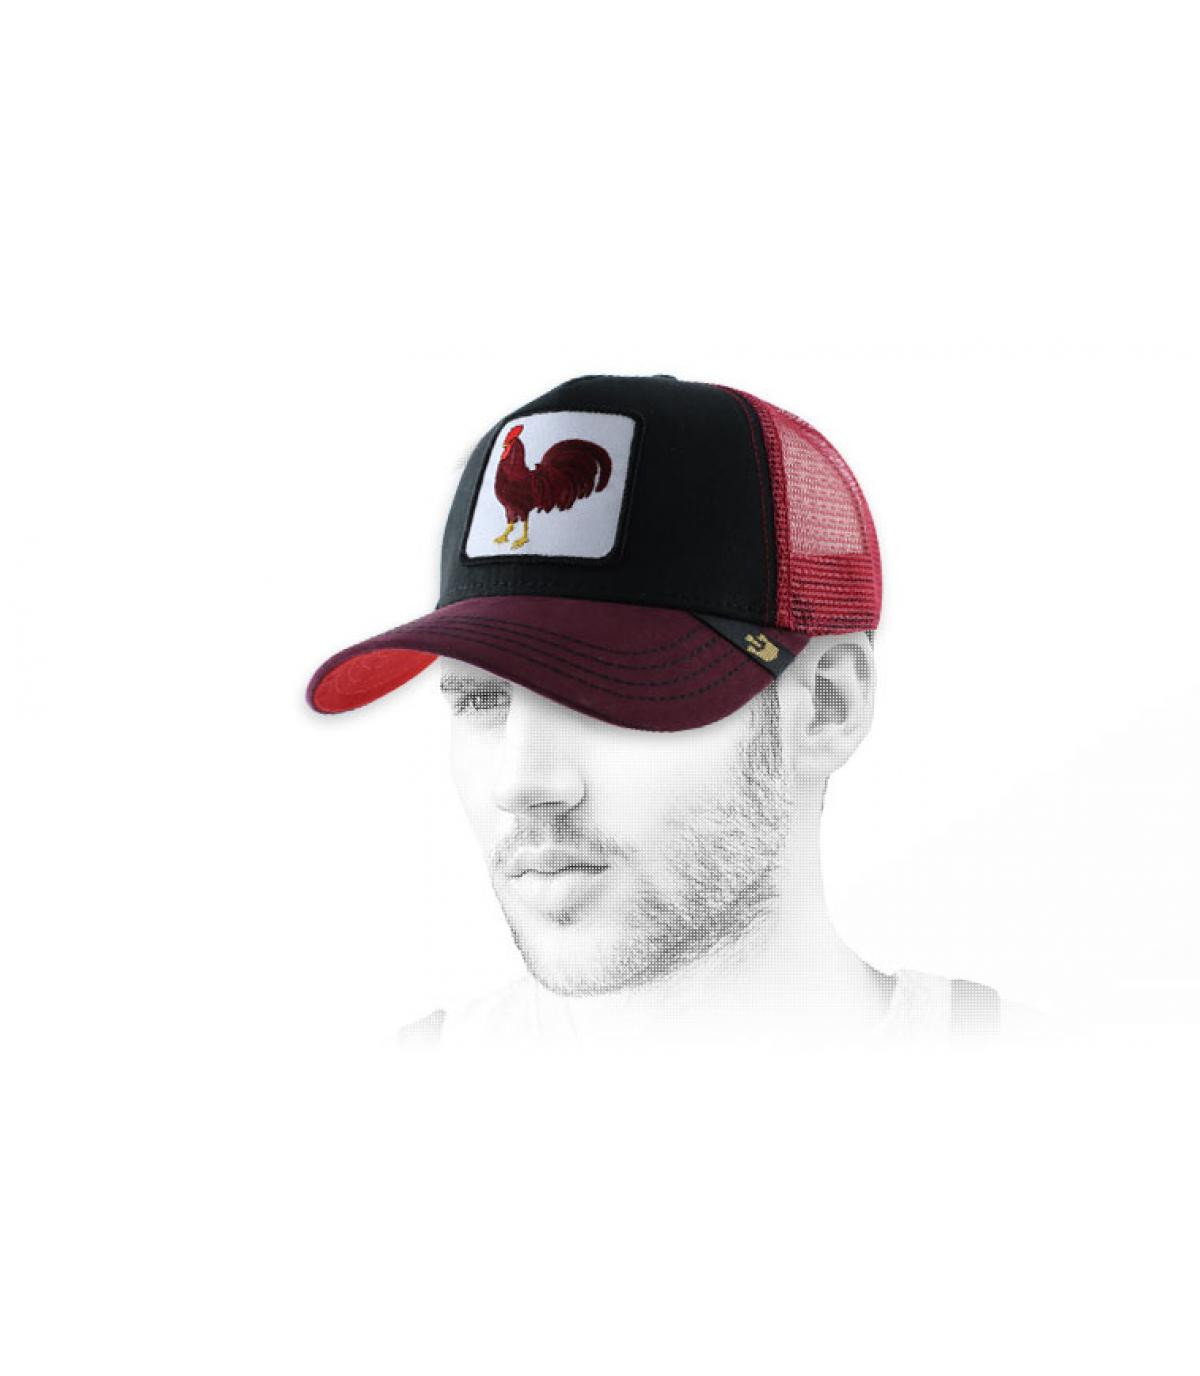 casquette coq rouge